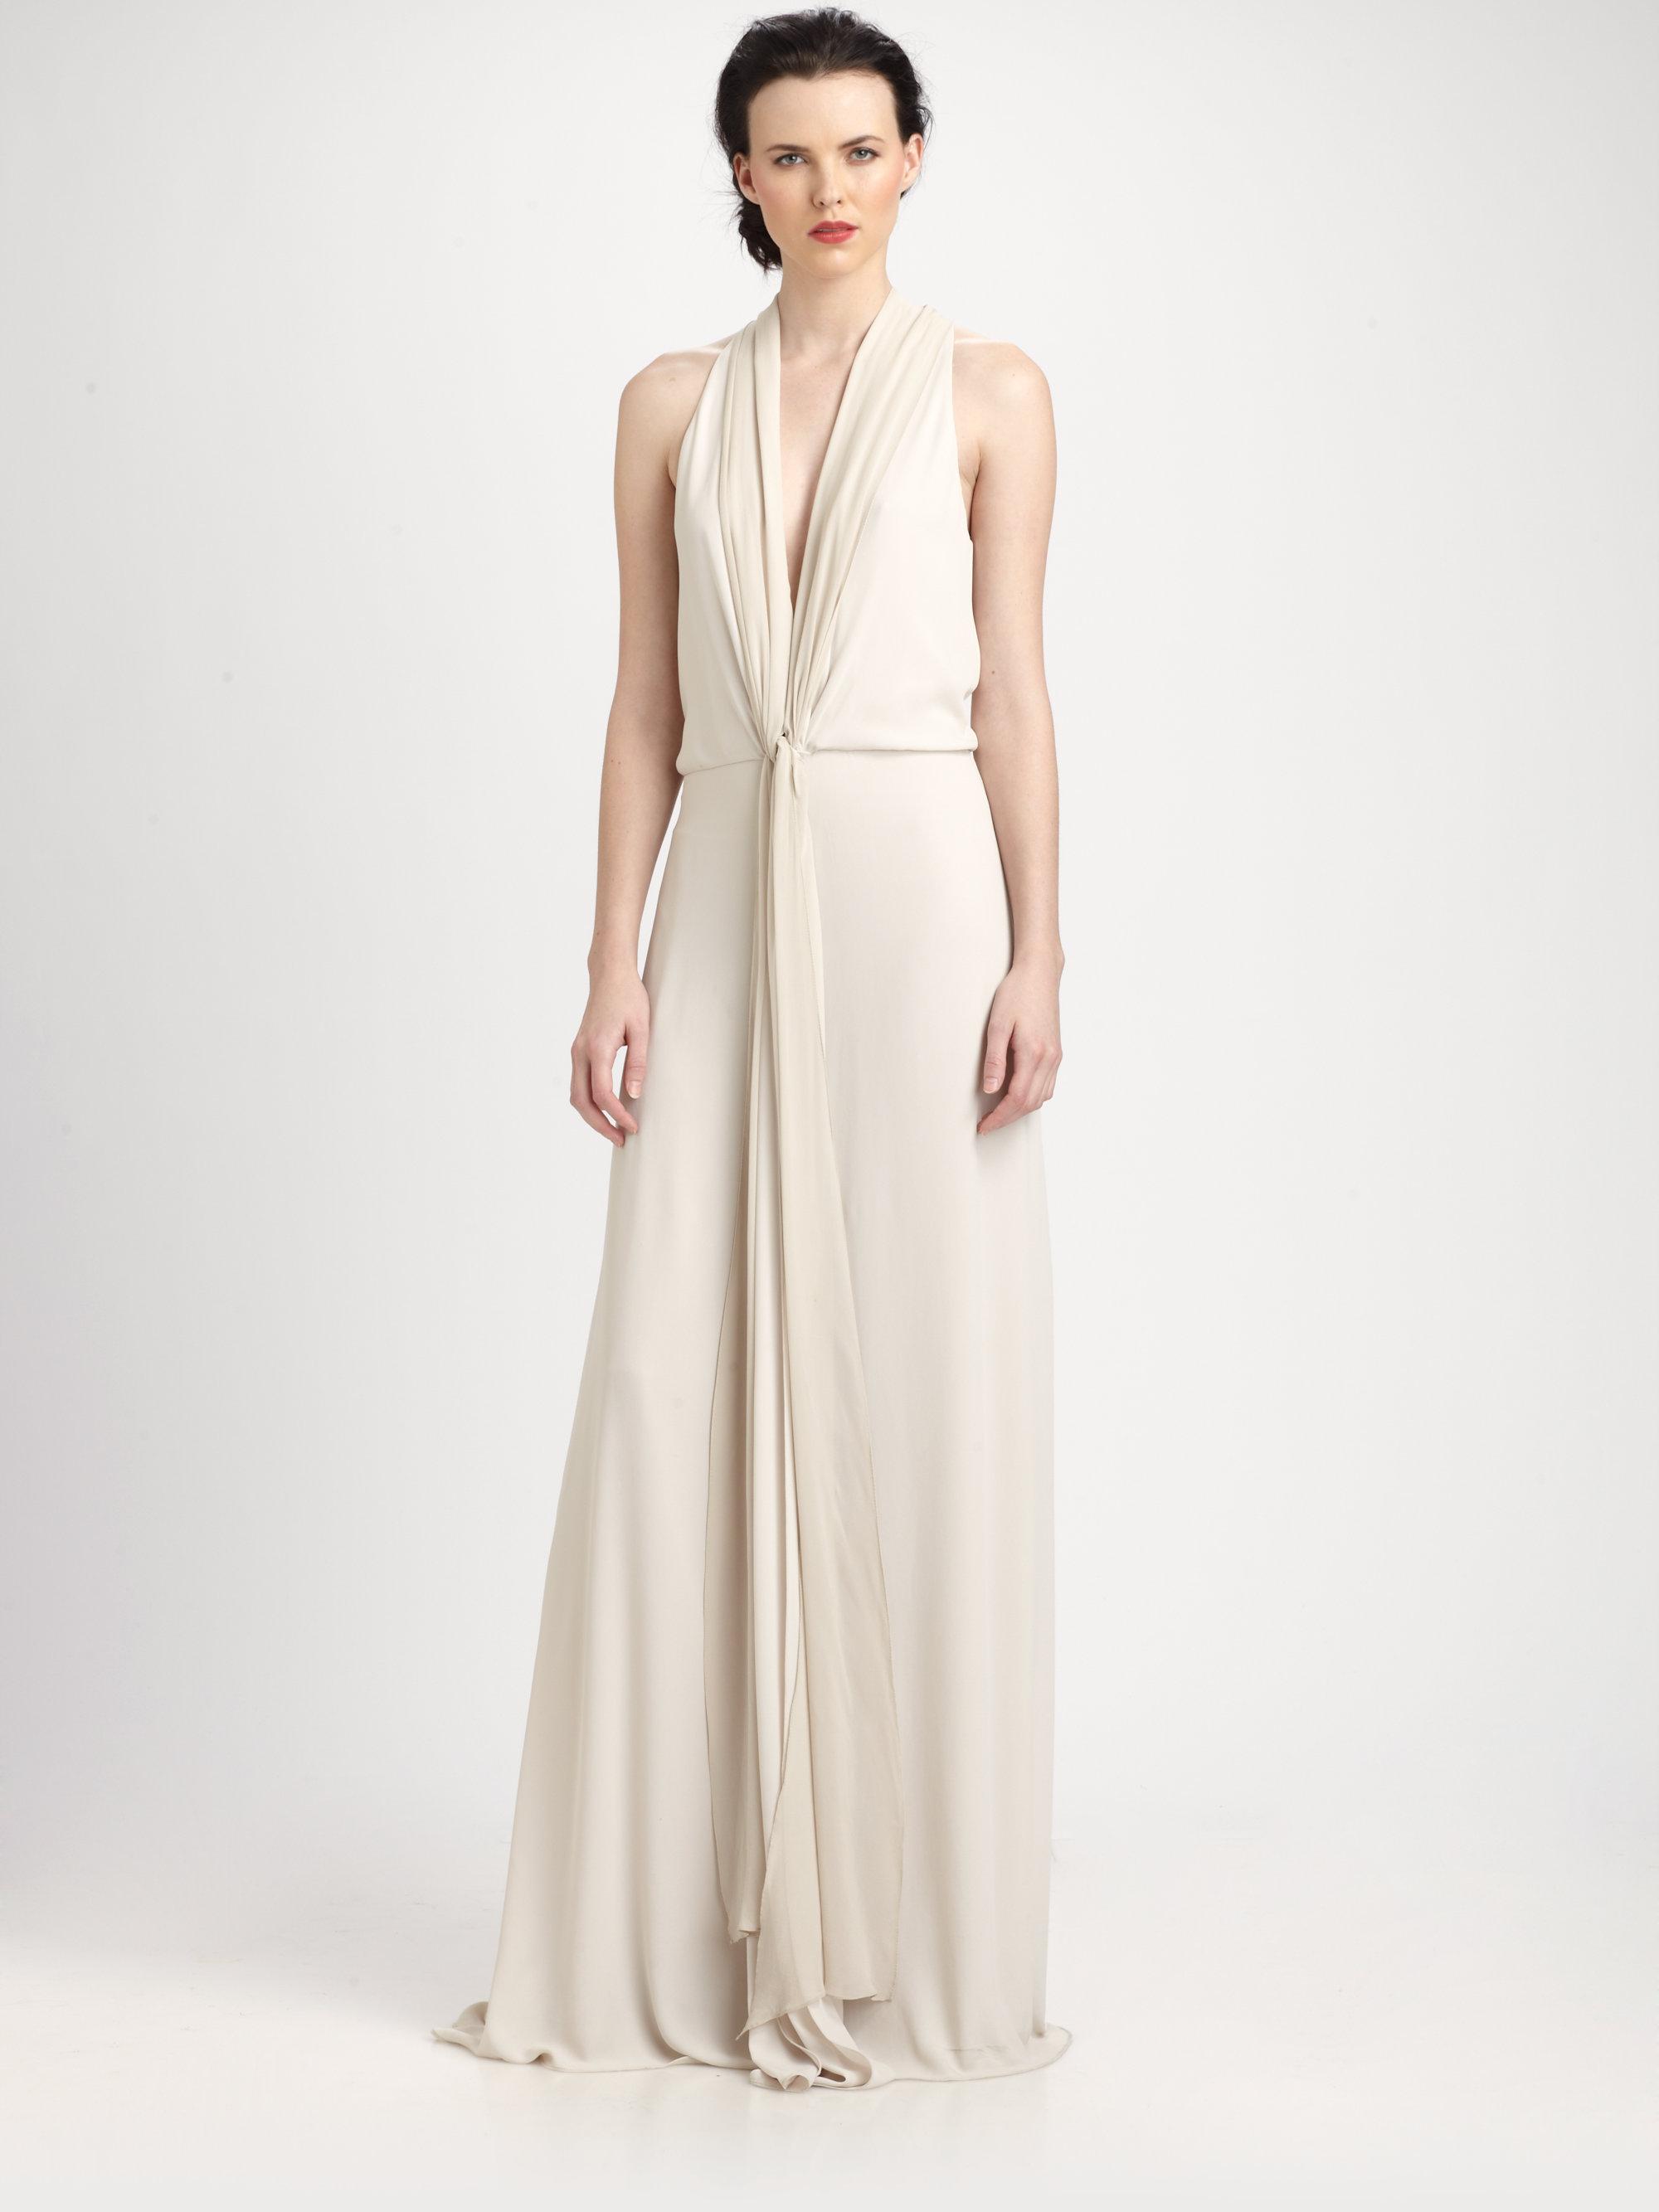 Bcbg Max Azria Wedding Dress